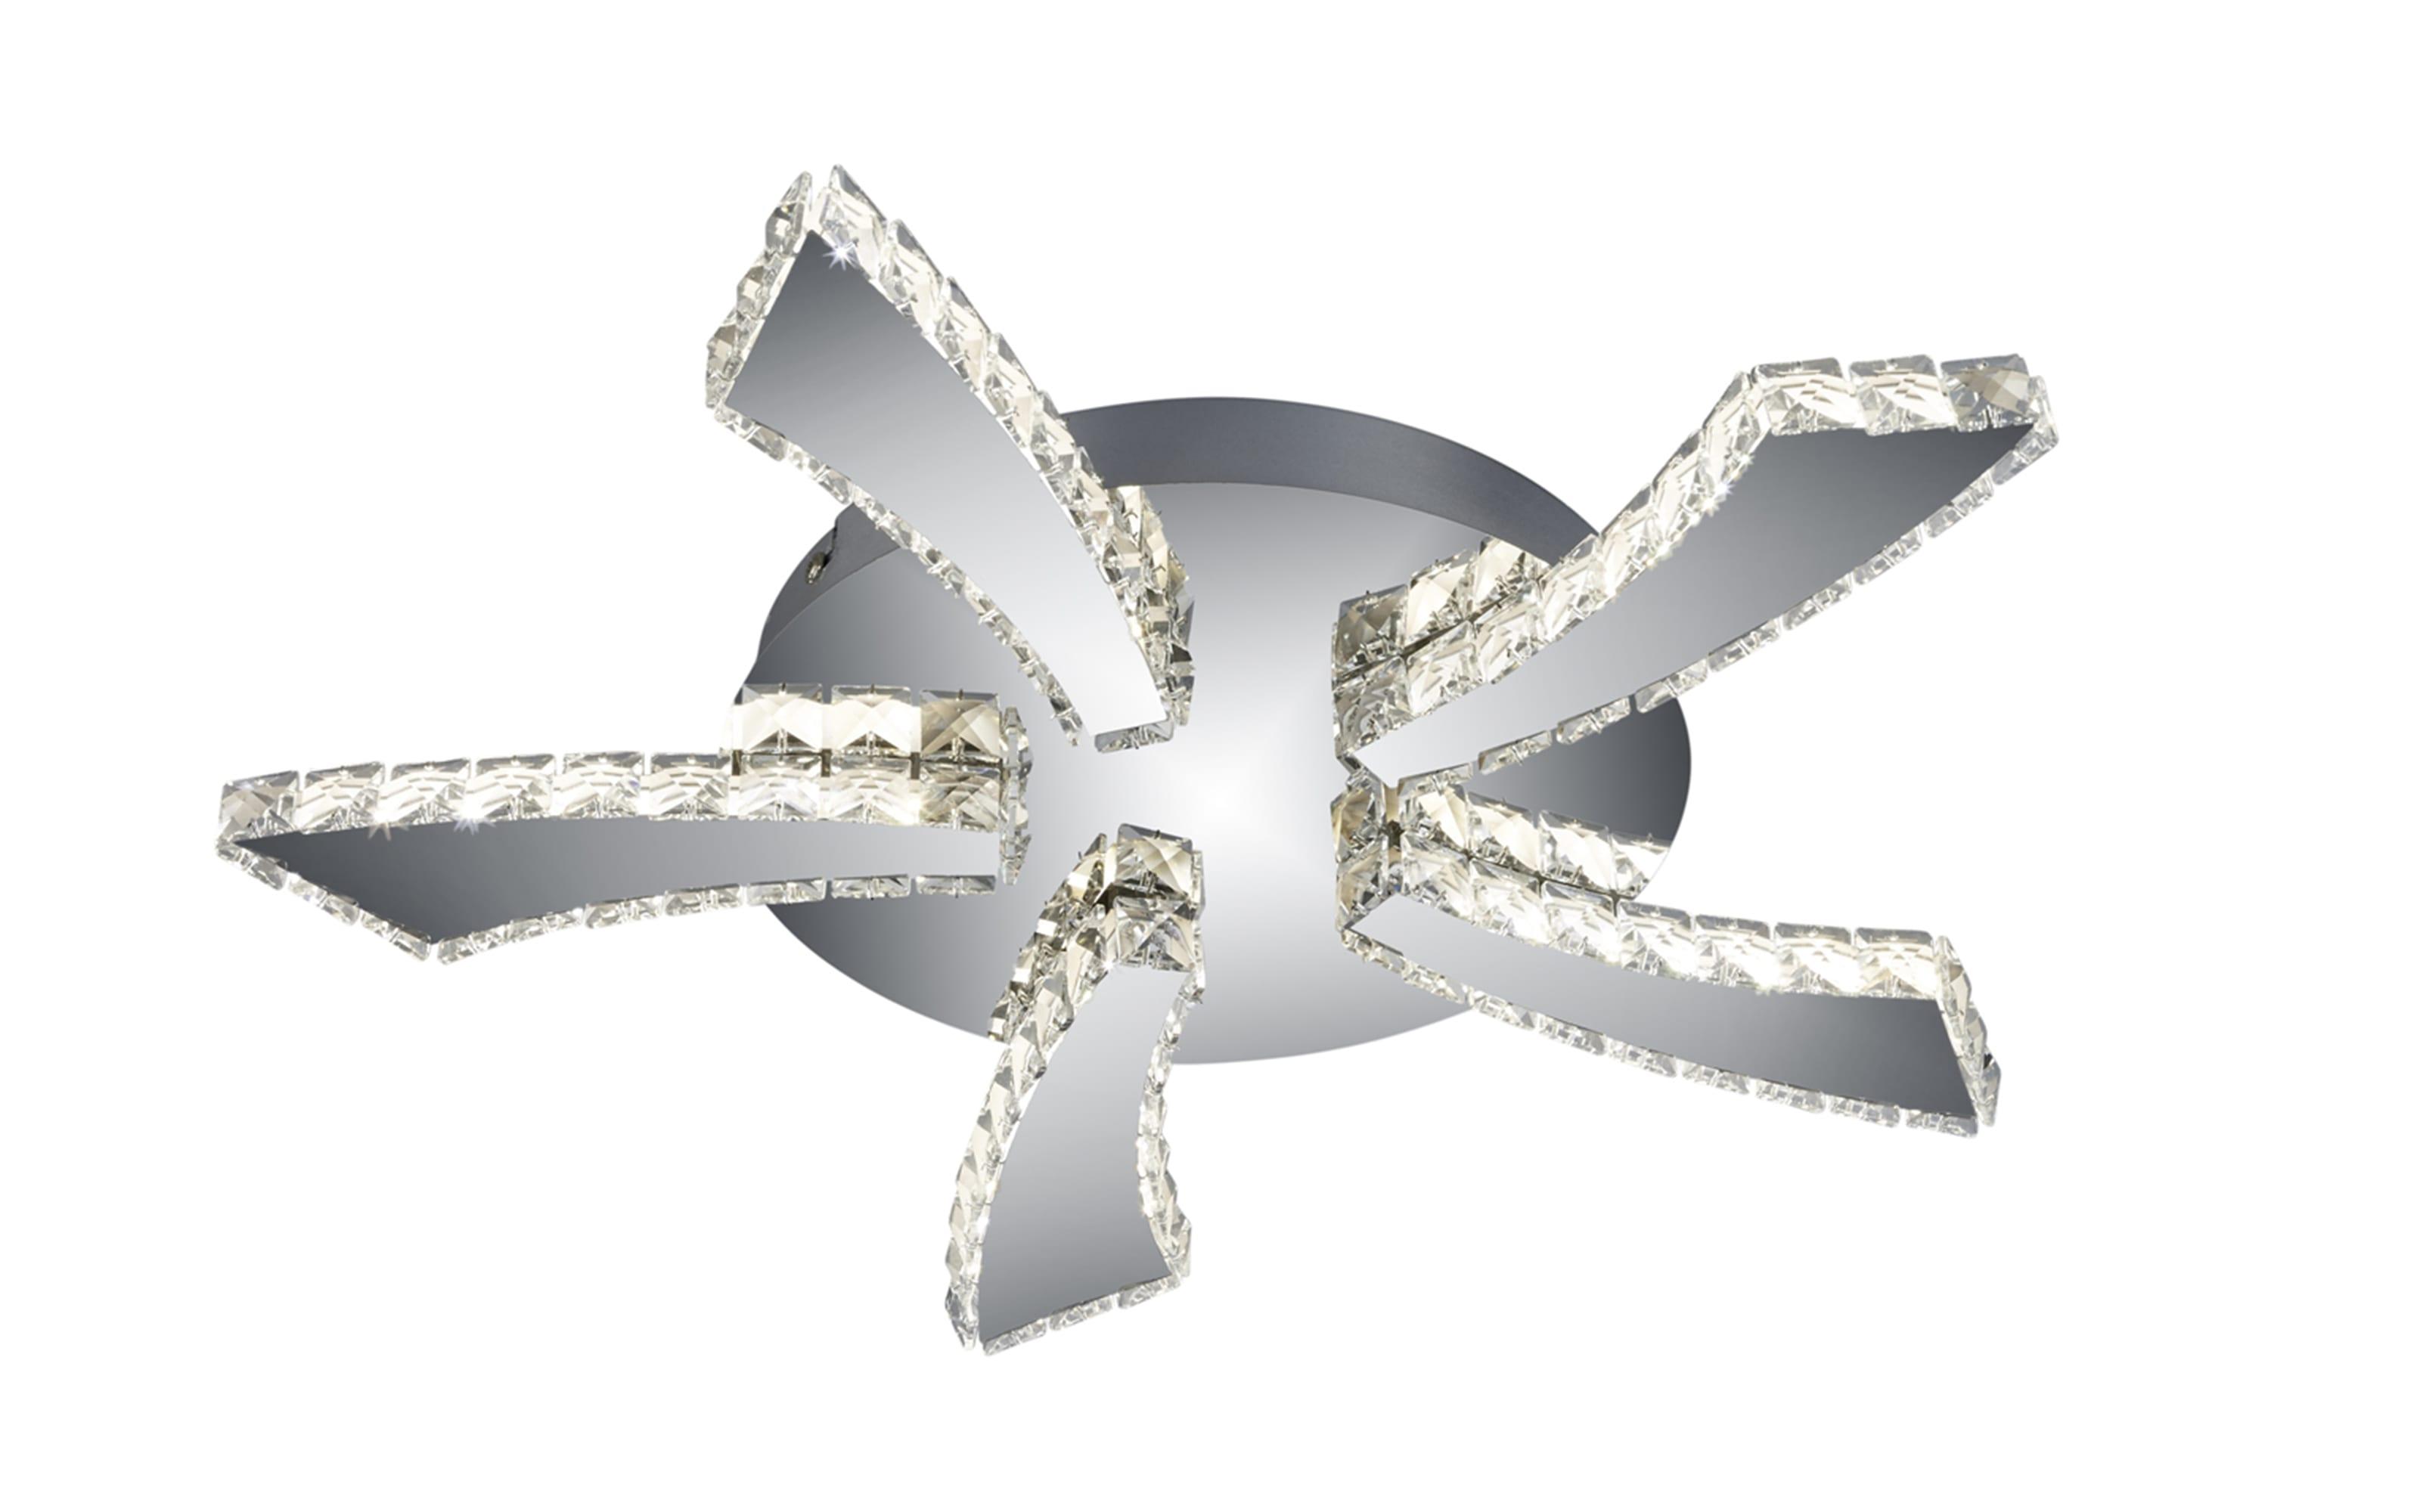 LED-Wandleuchte Phin in chromfarbig, 30 W